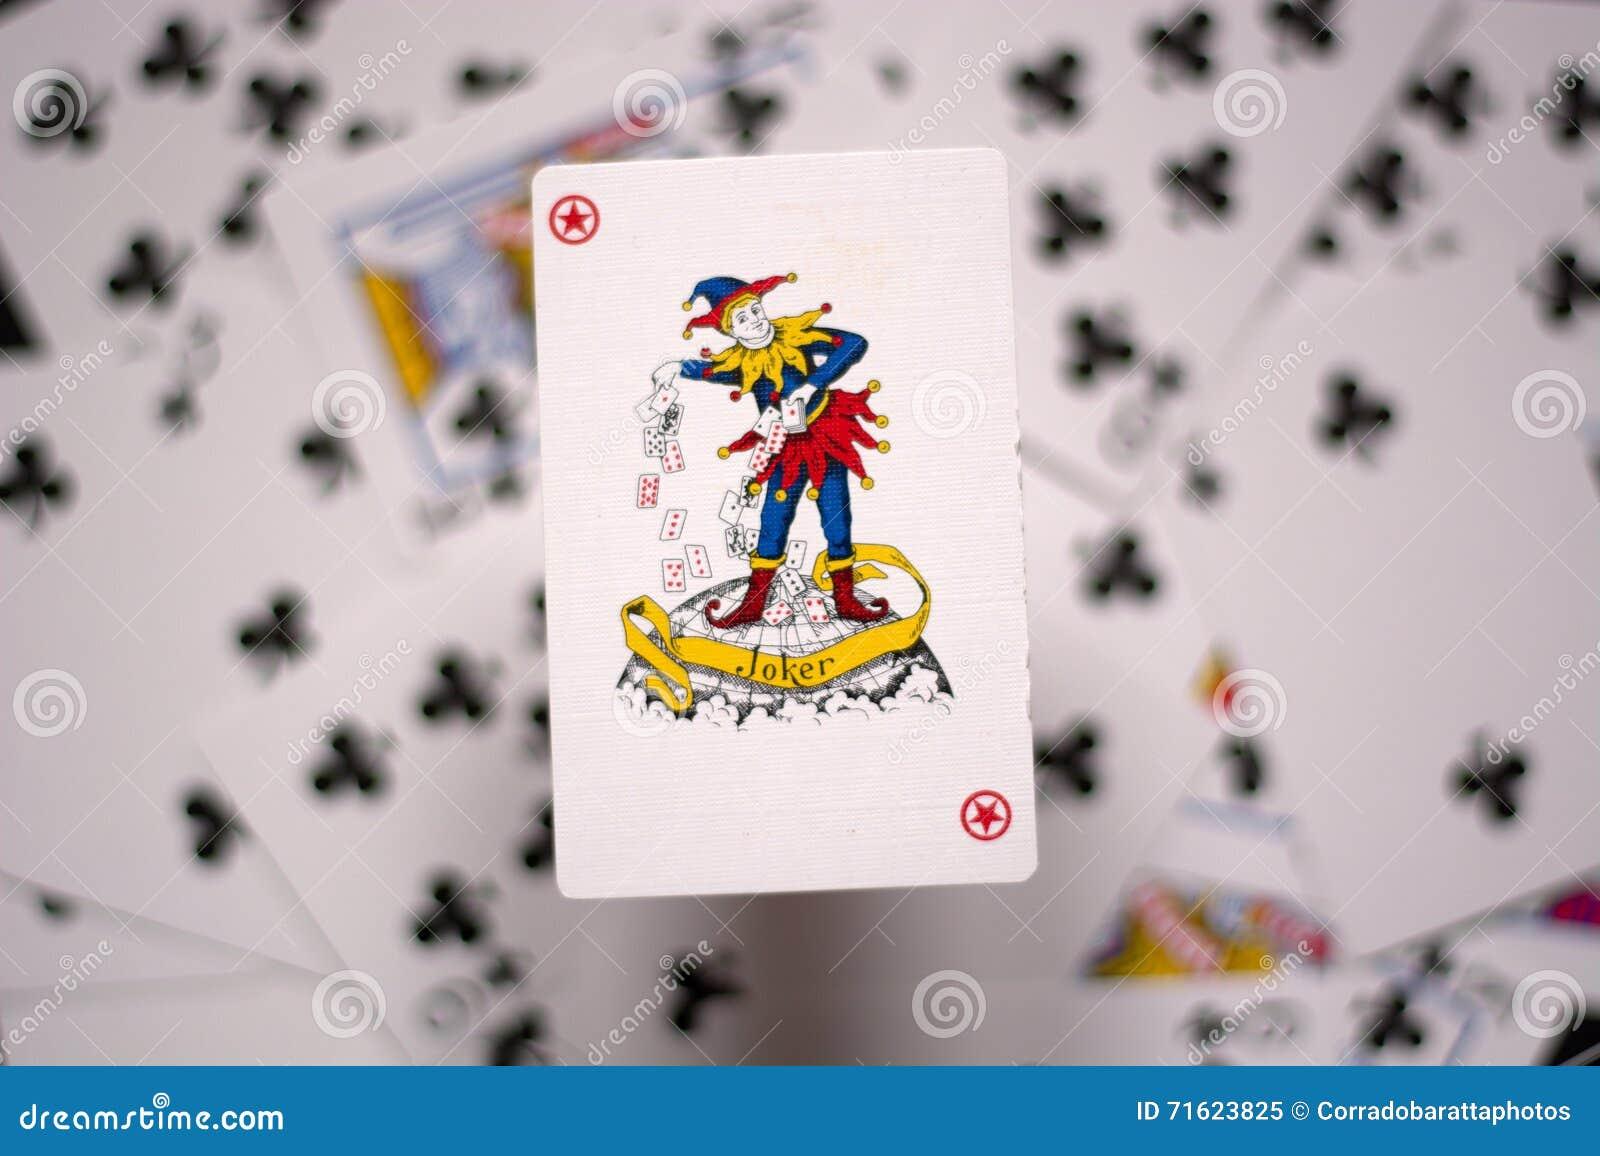 joker card stock photos - royalty free stock images